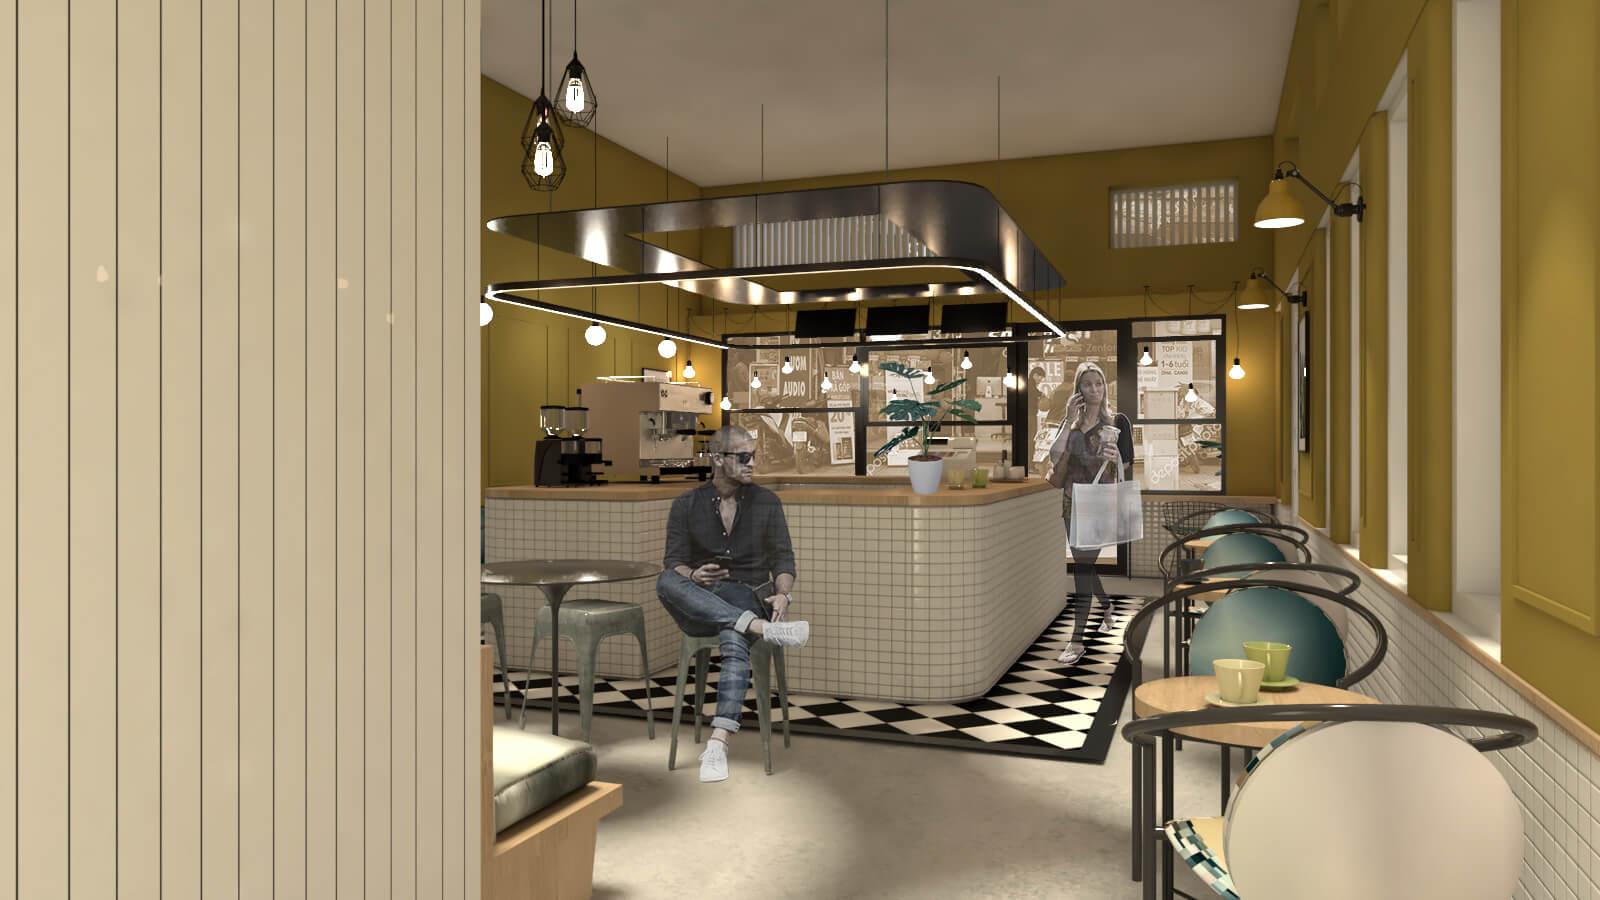 GHP 20190405_Scene 9 – Interior Cafe 1